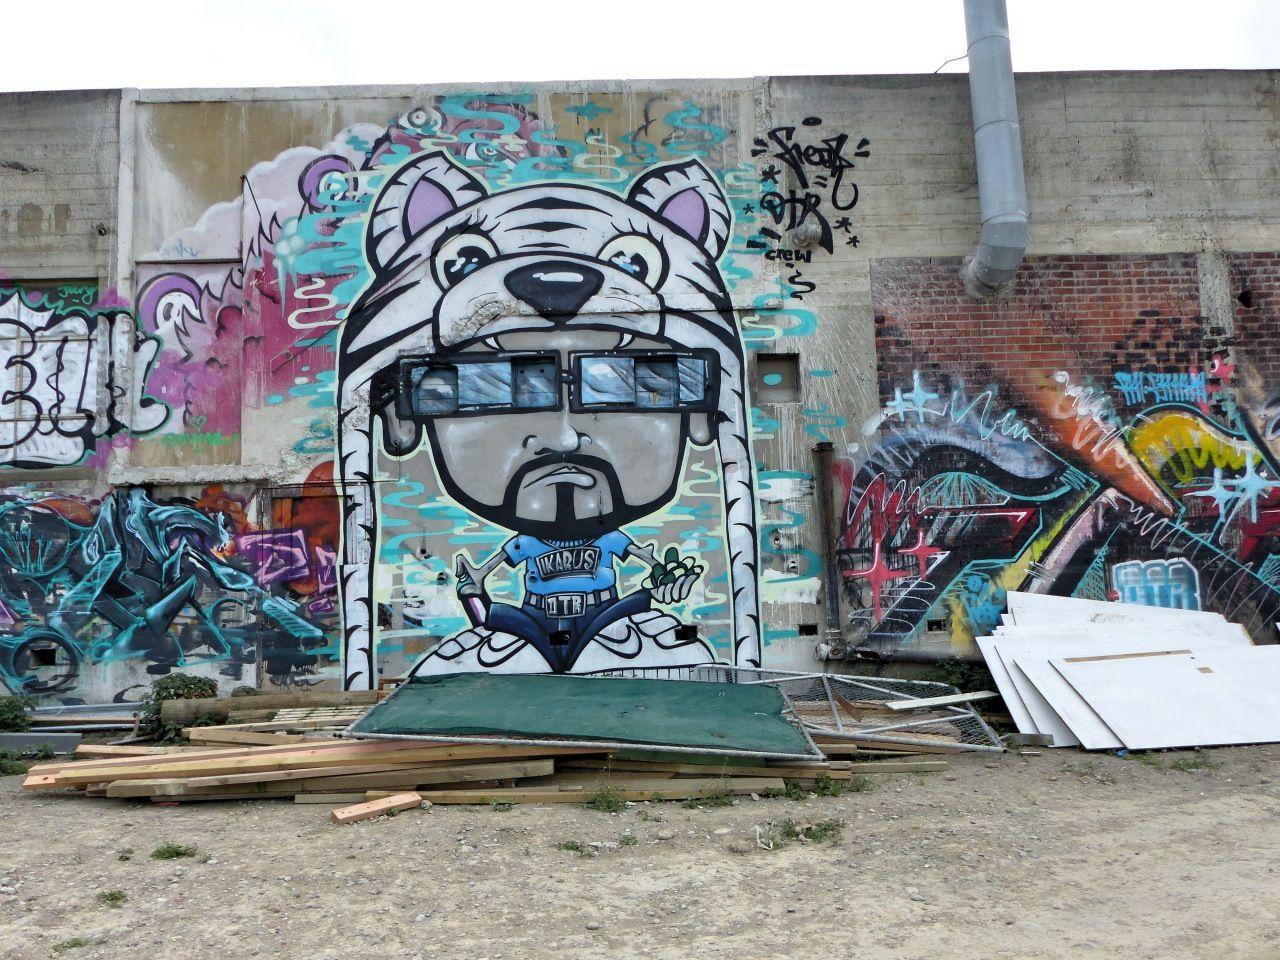 Graffiti wall christchurch - Wongi From Chch Dtr Spectrum Street Art Big Walls Christchurch Google Search